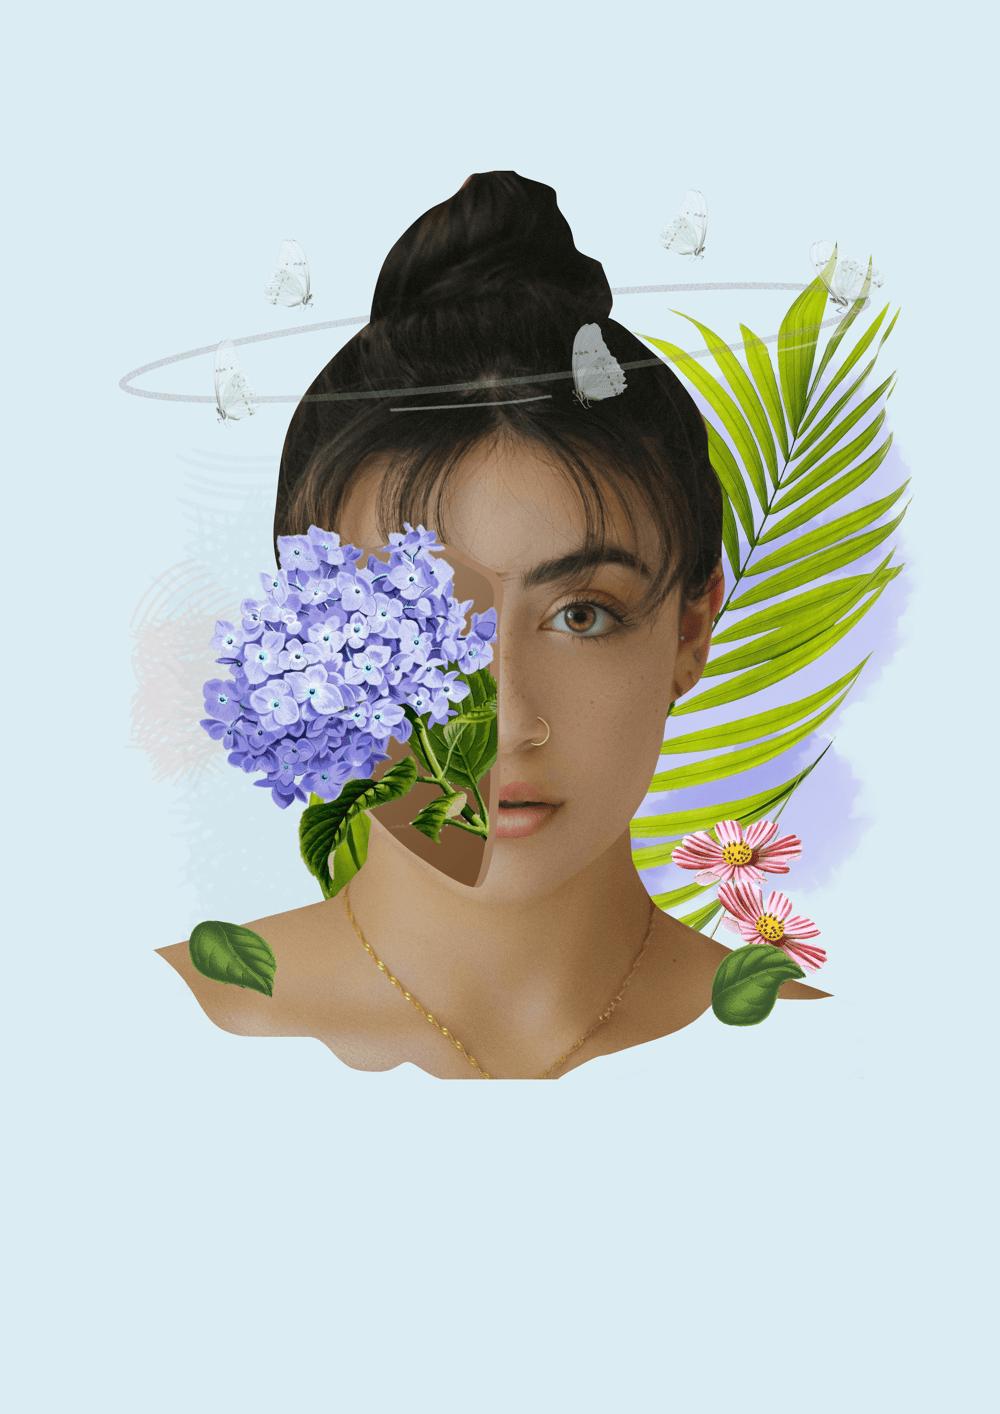 Digital Collage: Floral Potrait - image 1 - student project